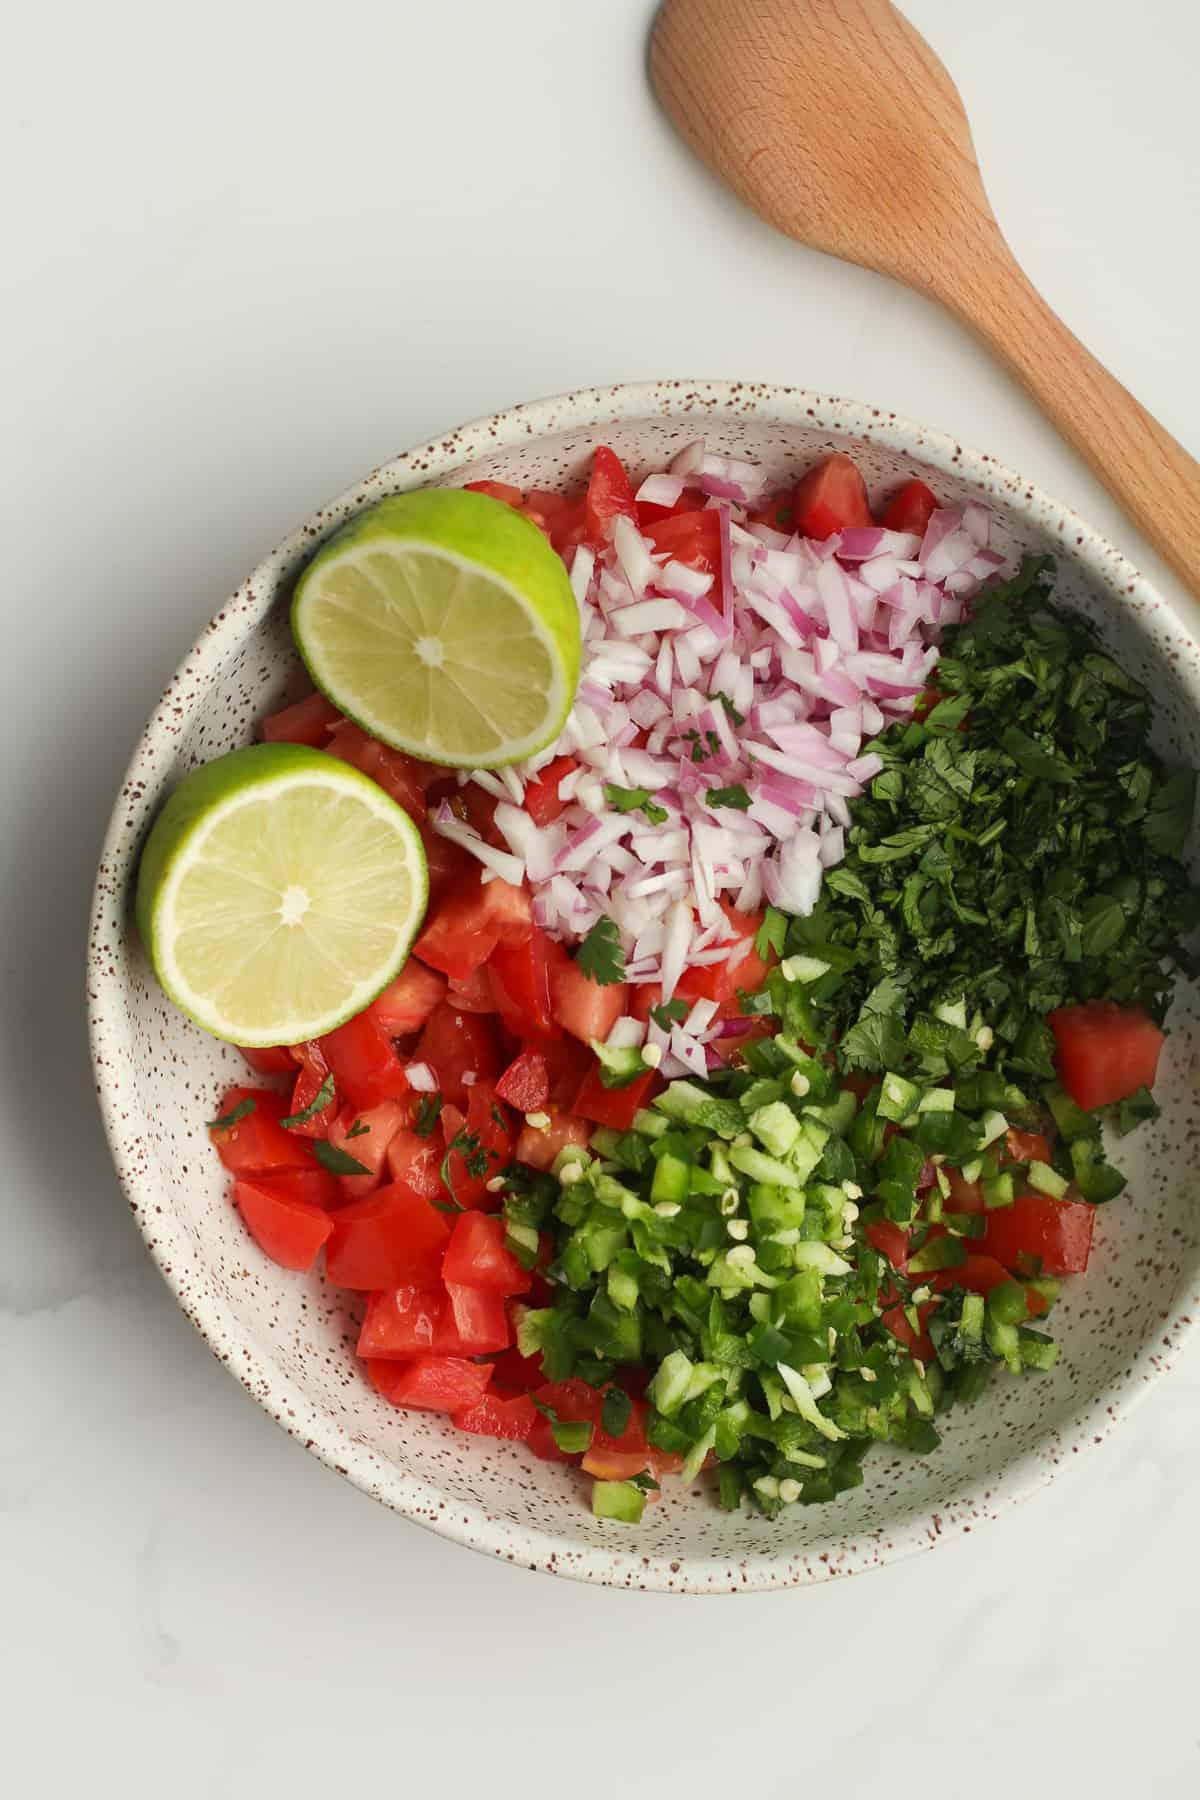 A bowl of the Pico de Gallo ingredients.